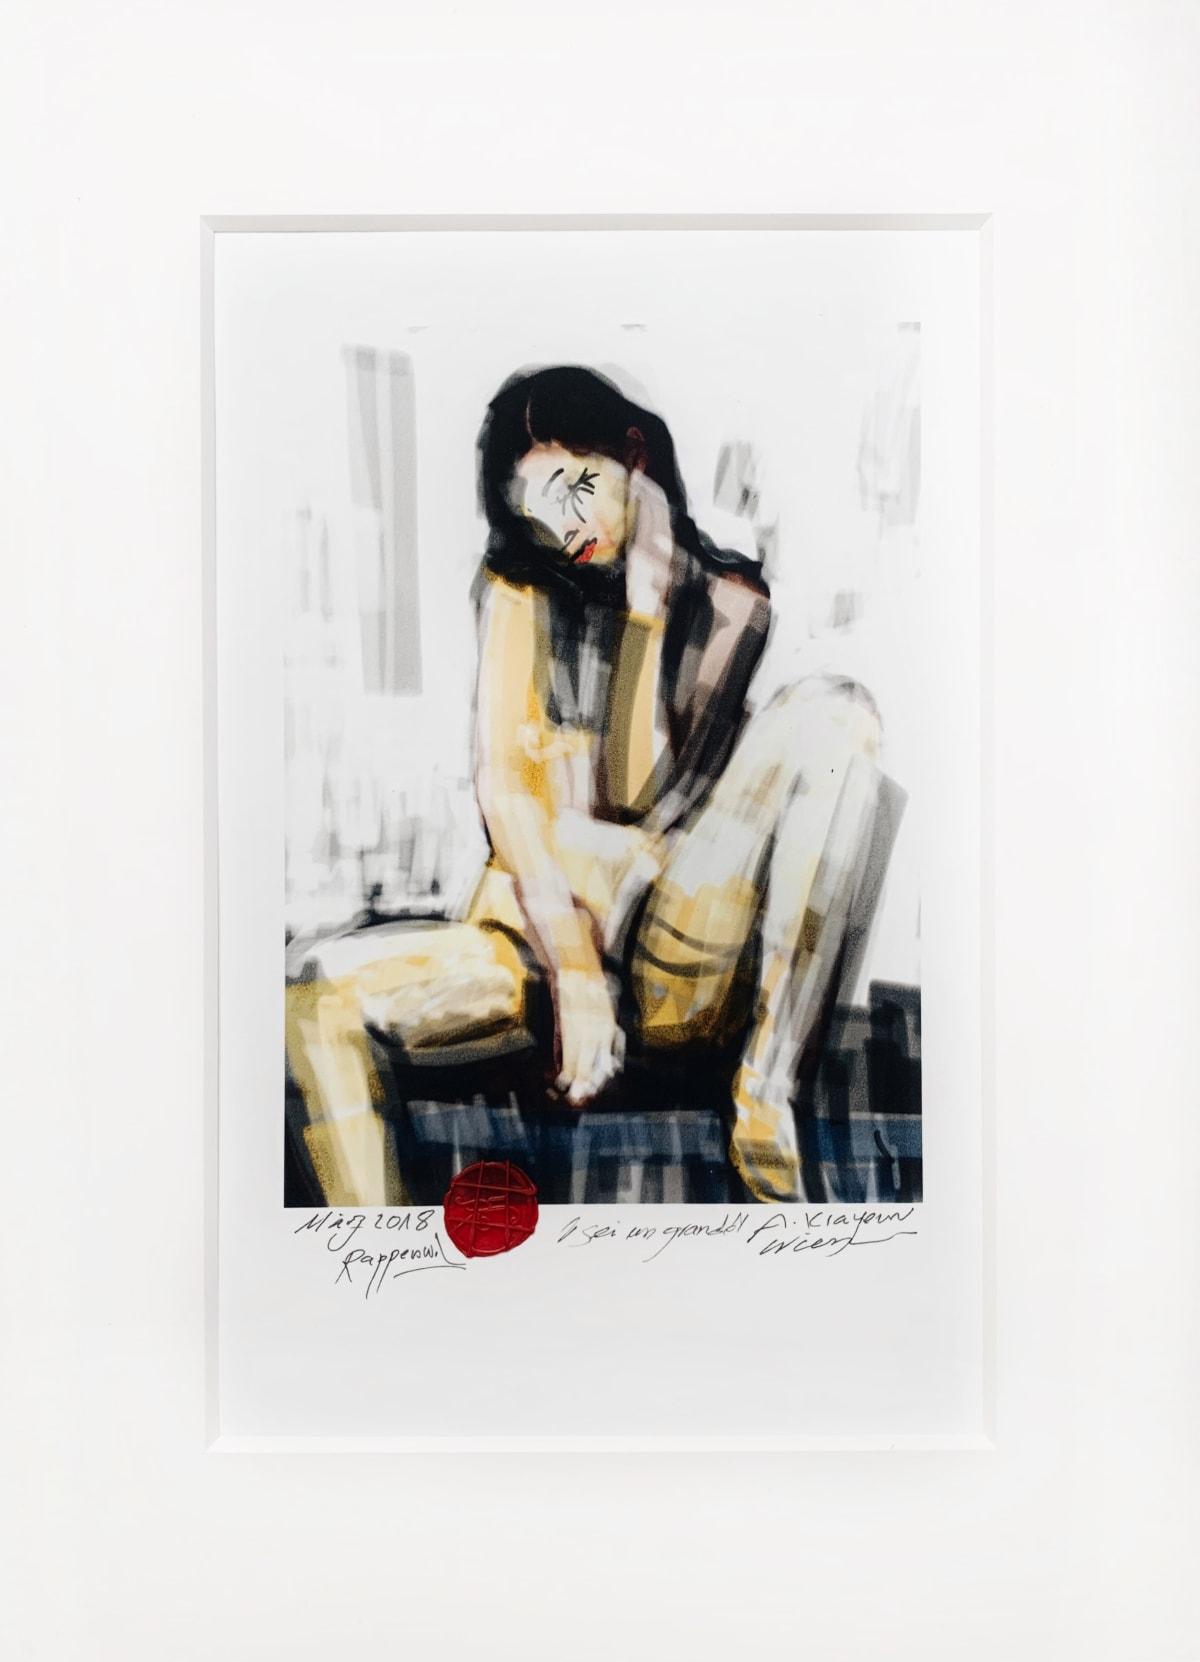 Krayem Maria Awad Sei un Grande, 2018 Digital Art, Glicee Print on UV Coated Paper Piece Unique 30 x 20 cm (Framed) 12 x 8 in (Framed)